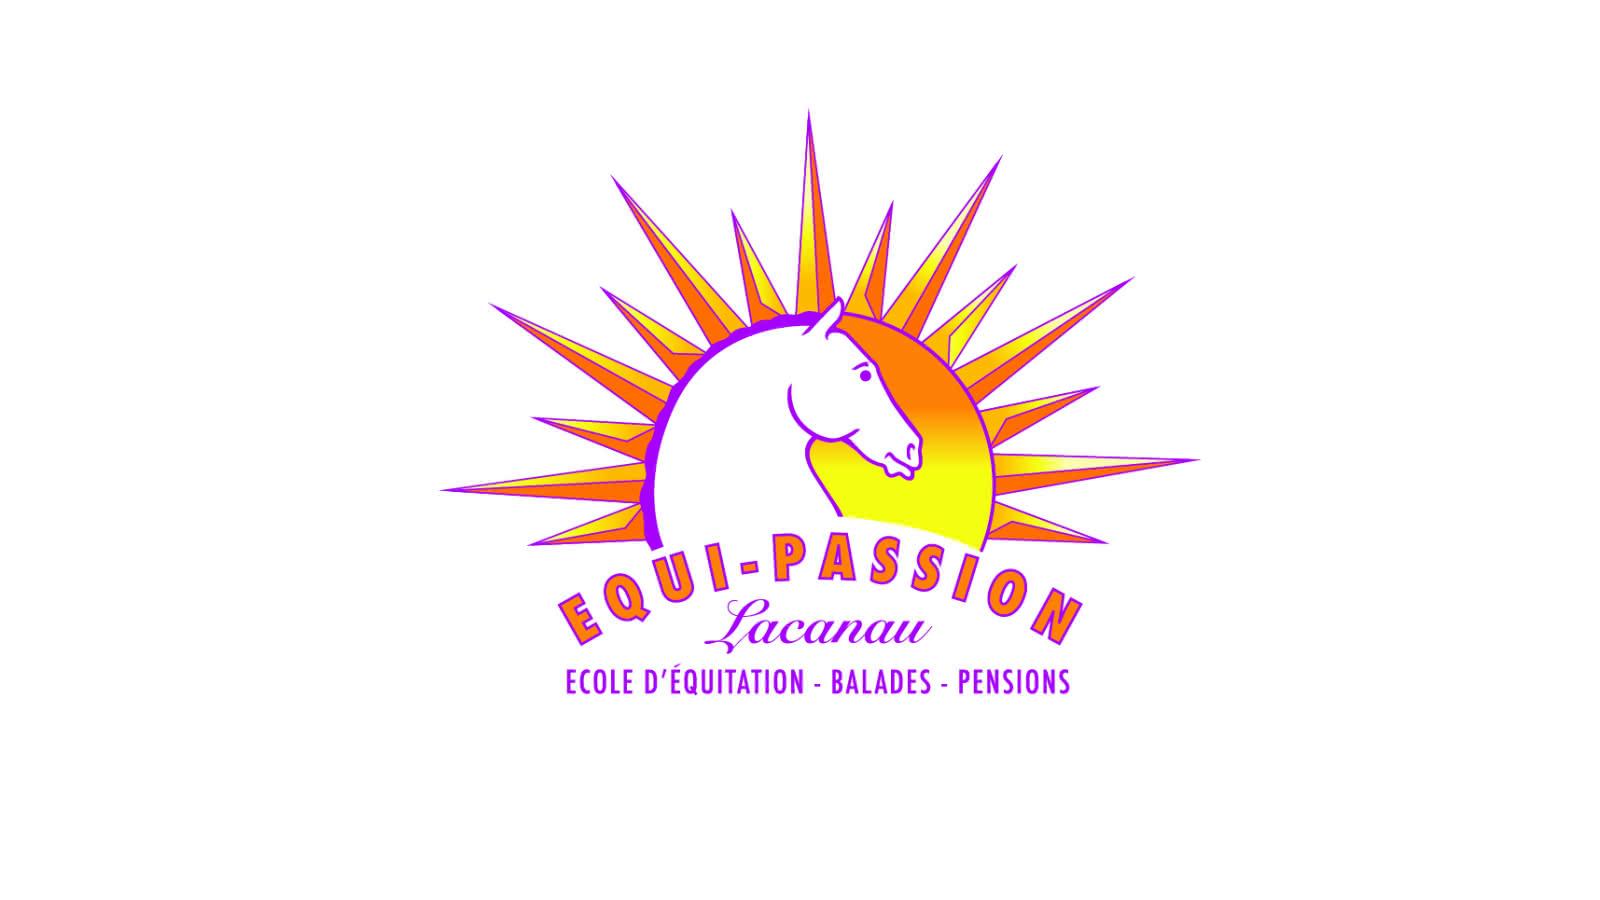 logo-equipassion-2019